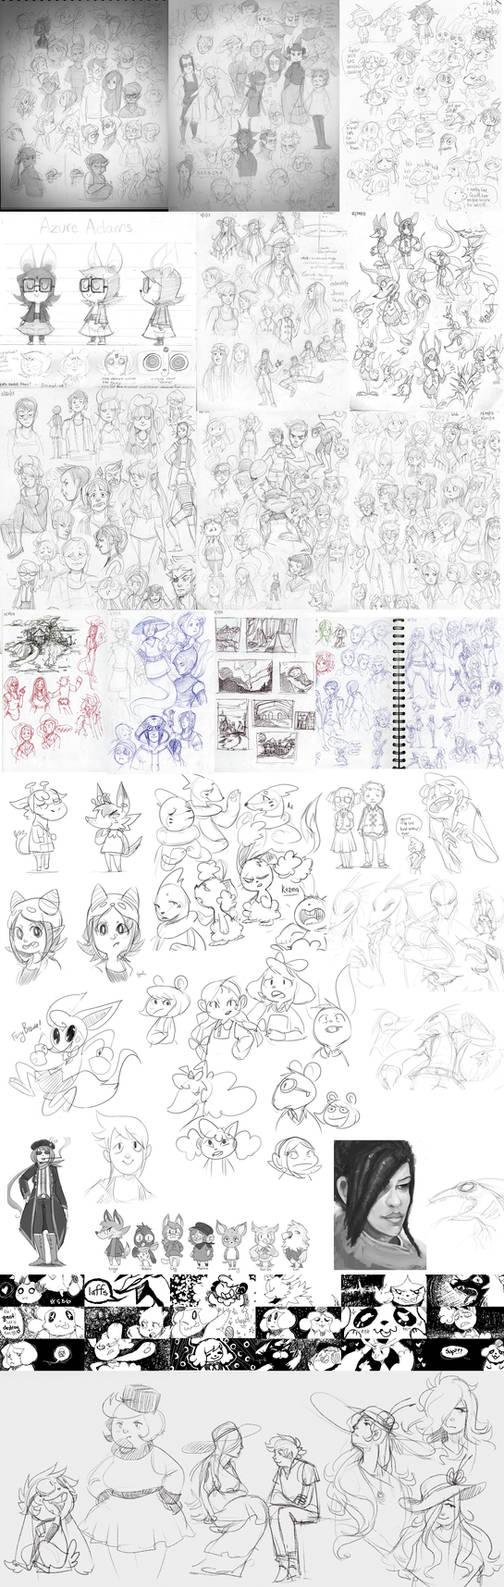 2013 Sketchdump Pt.1 [B+W]